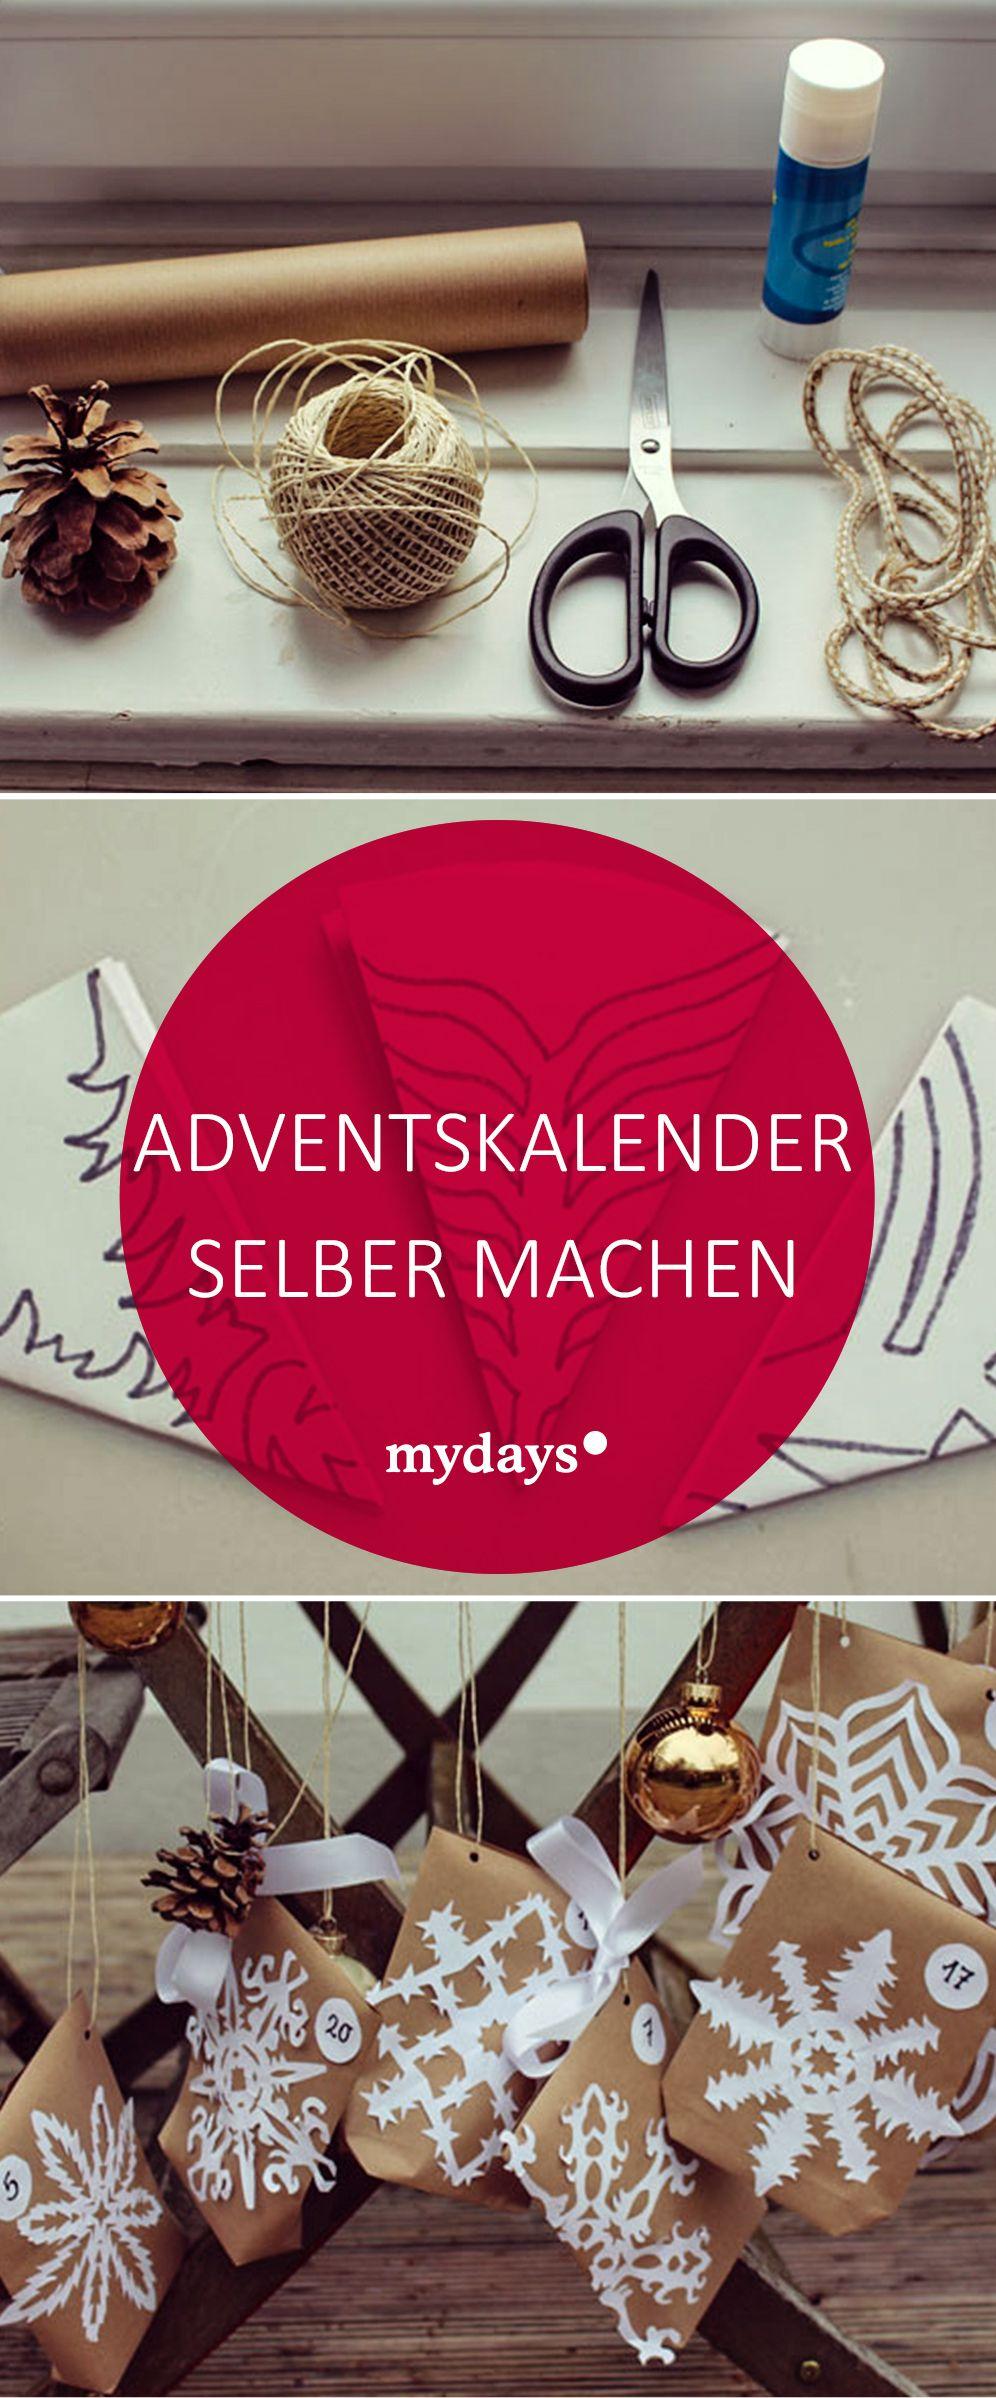 DIY Adventskalender basteln 24 kreative Türchen